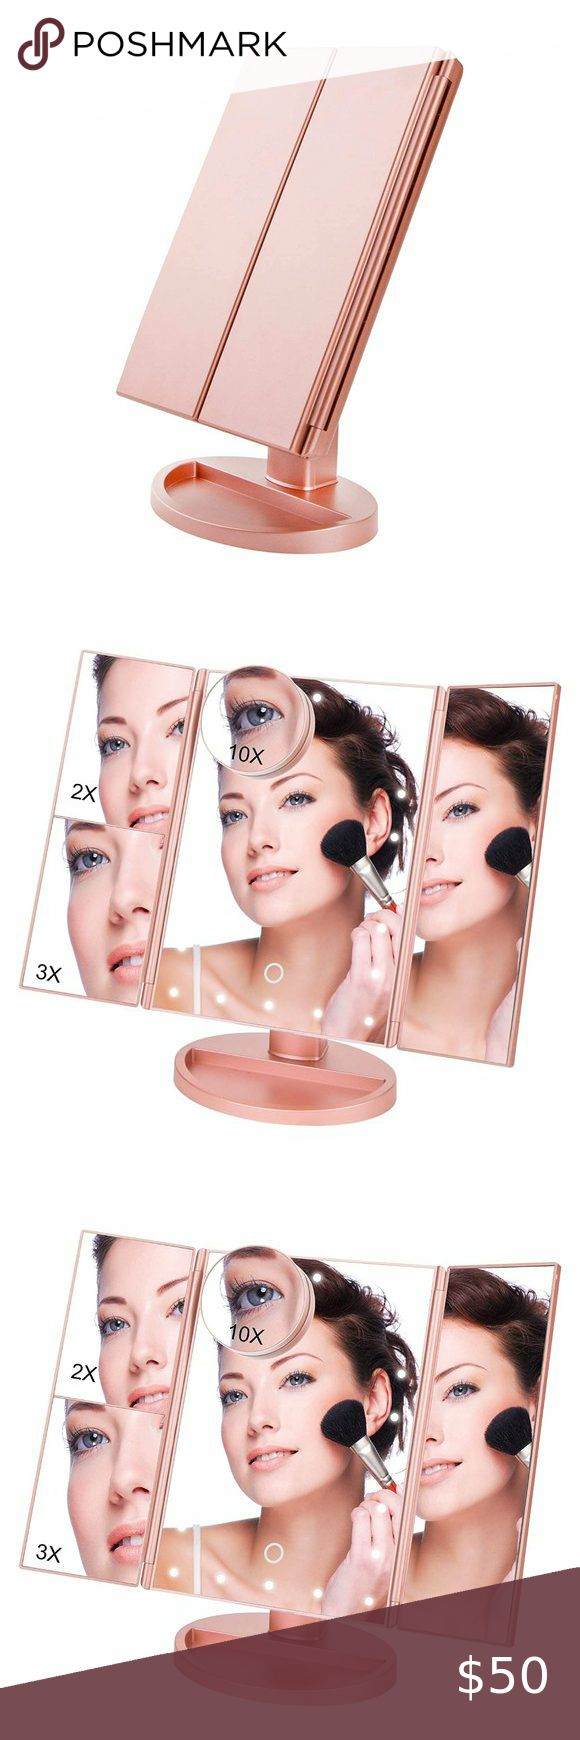 Makeup Vanity Cosmetic Mirror 21 LED Lights in 2020